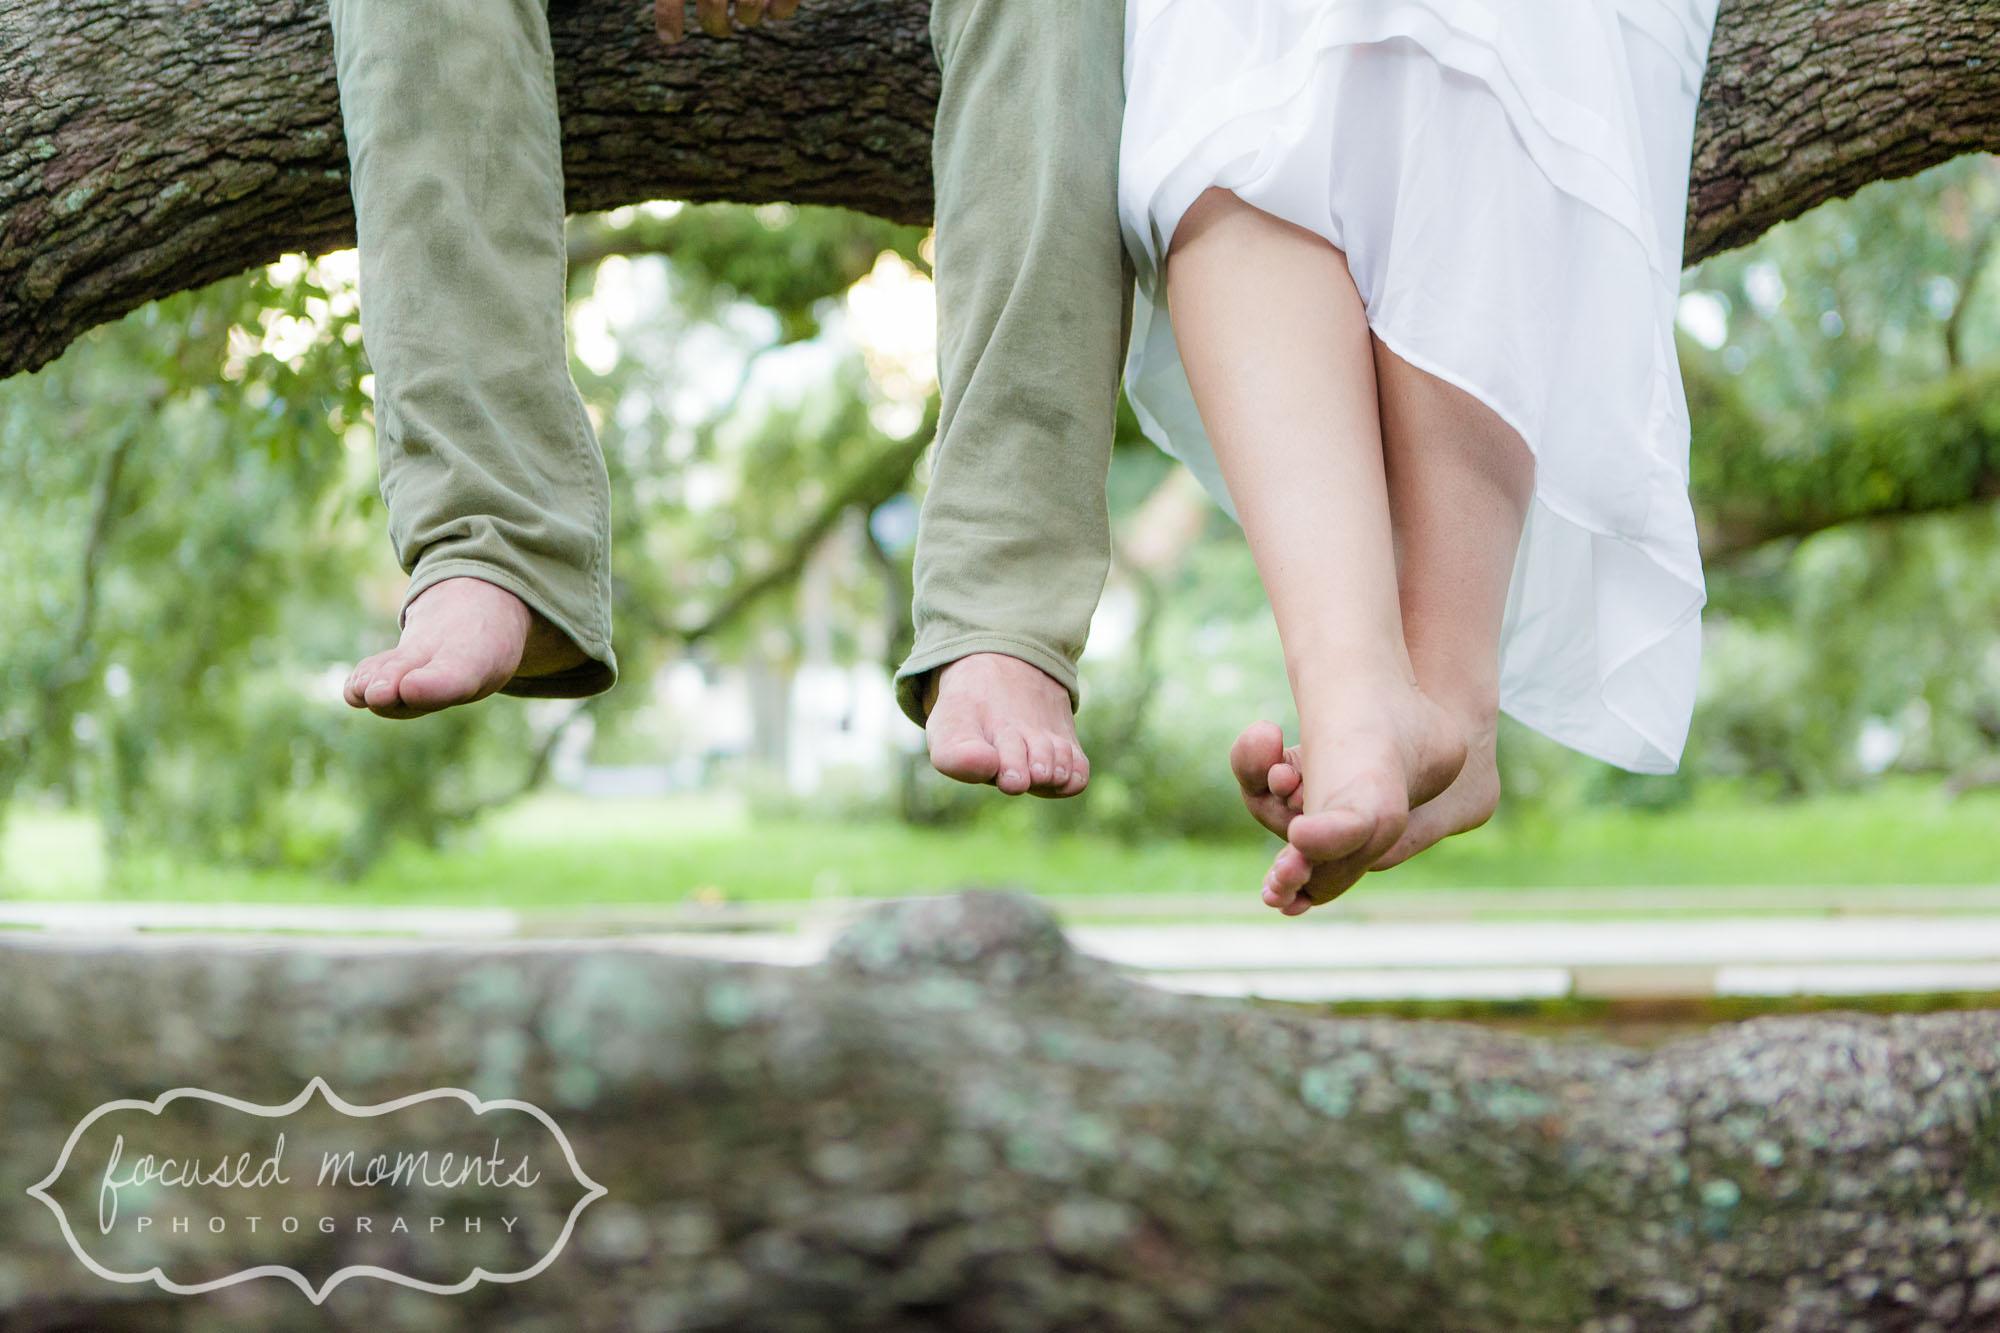 2013_08_03_Treaty_Oaks_Park_Jacksonville_Engagement_Photography_24.jpg